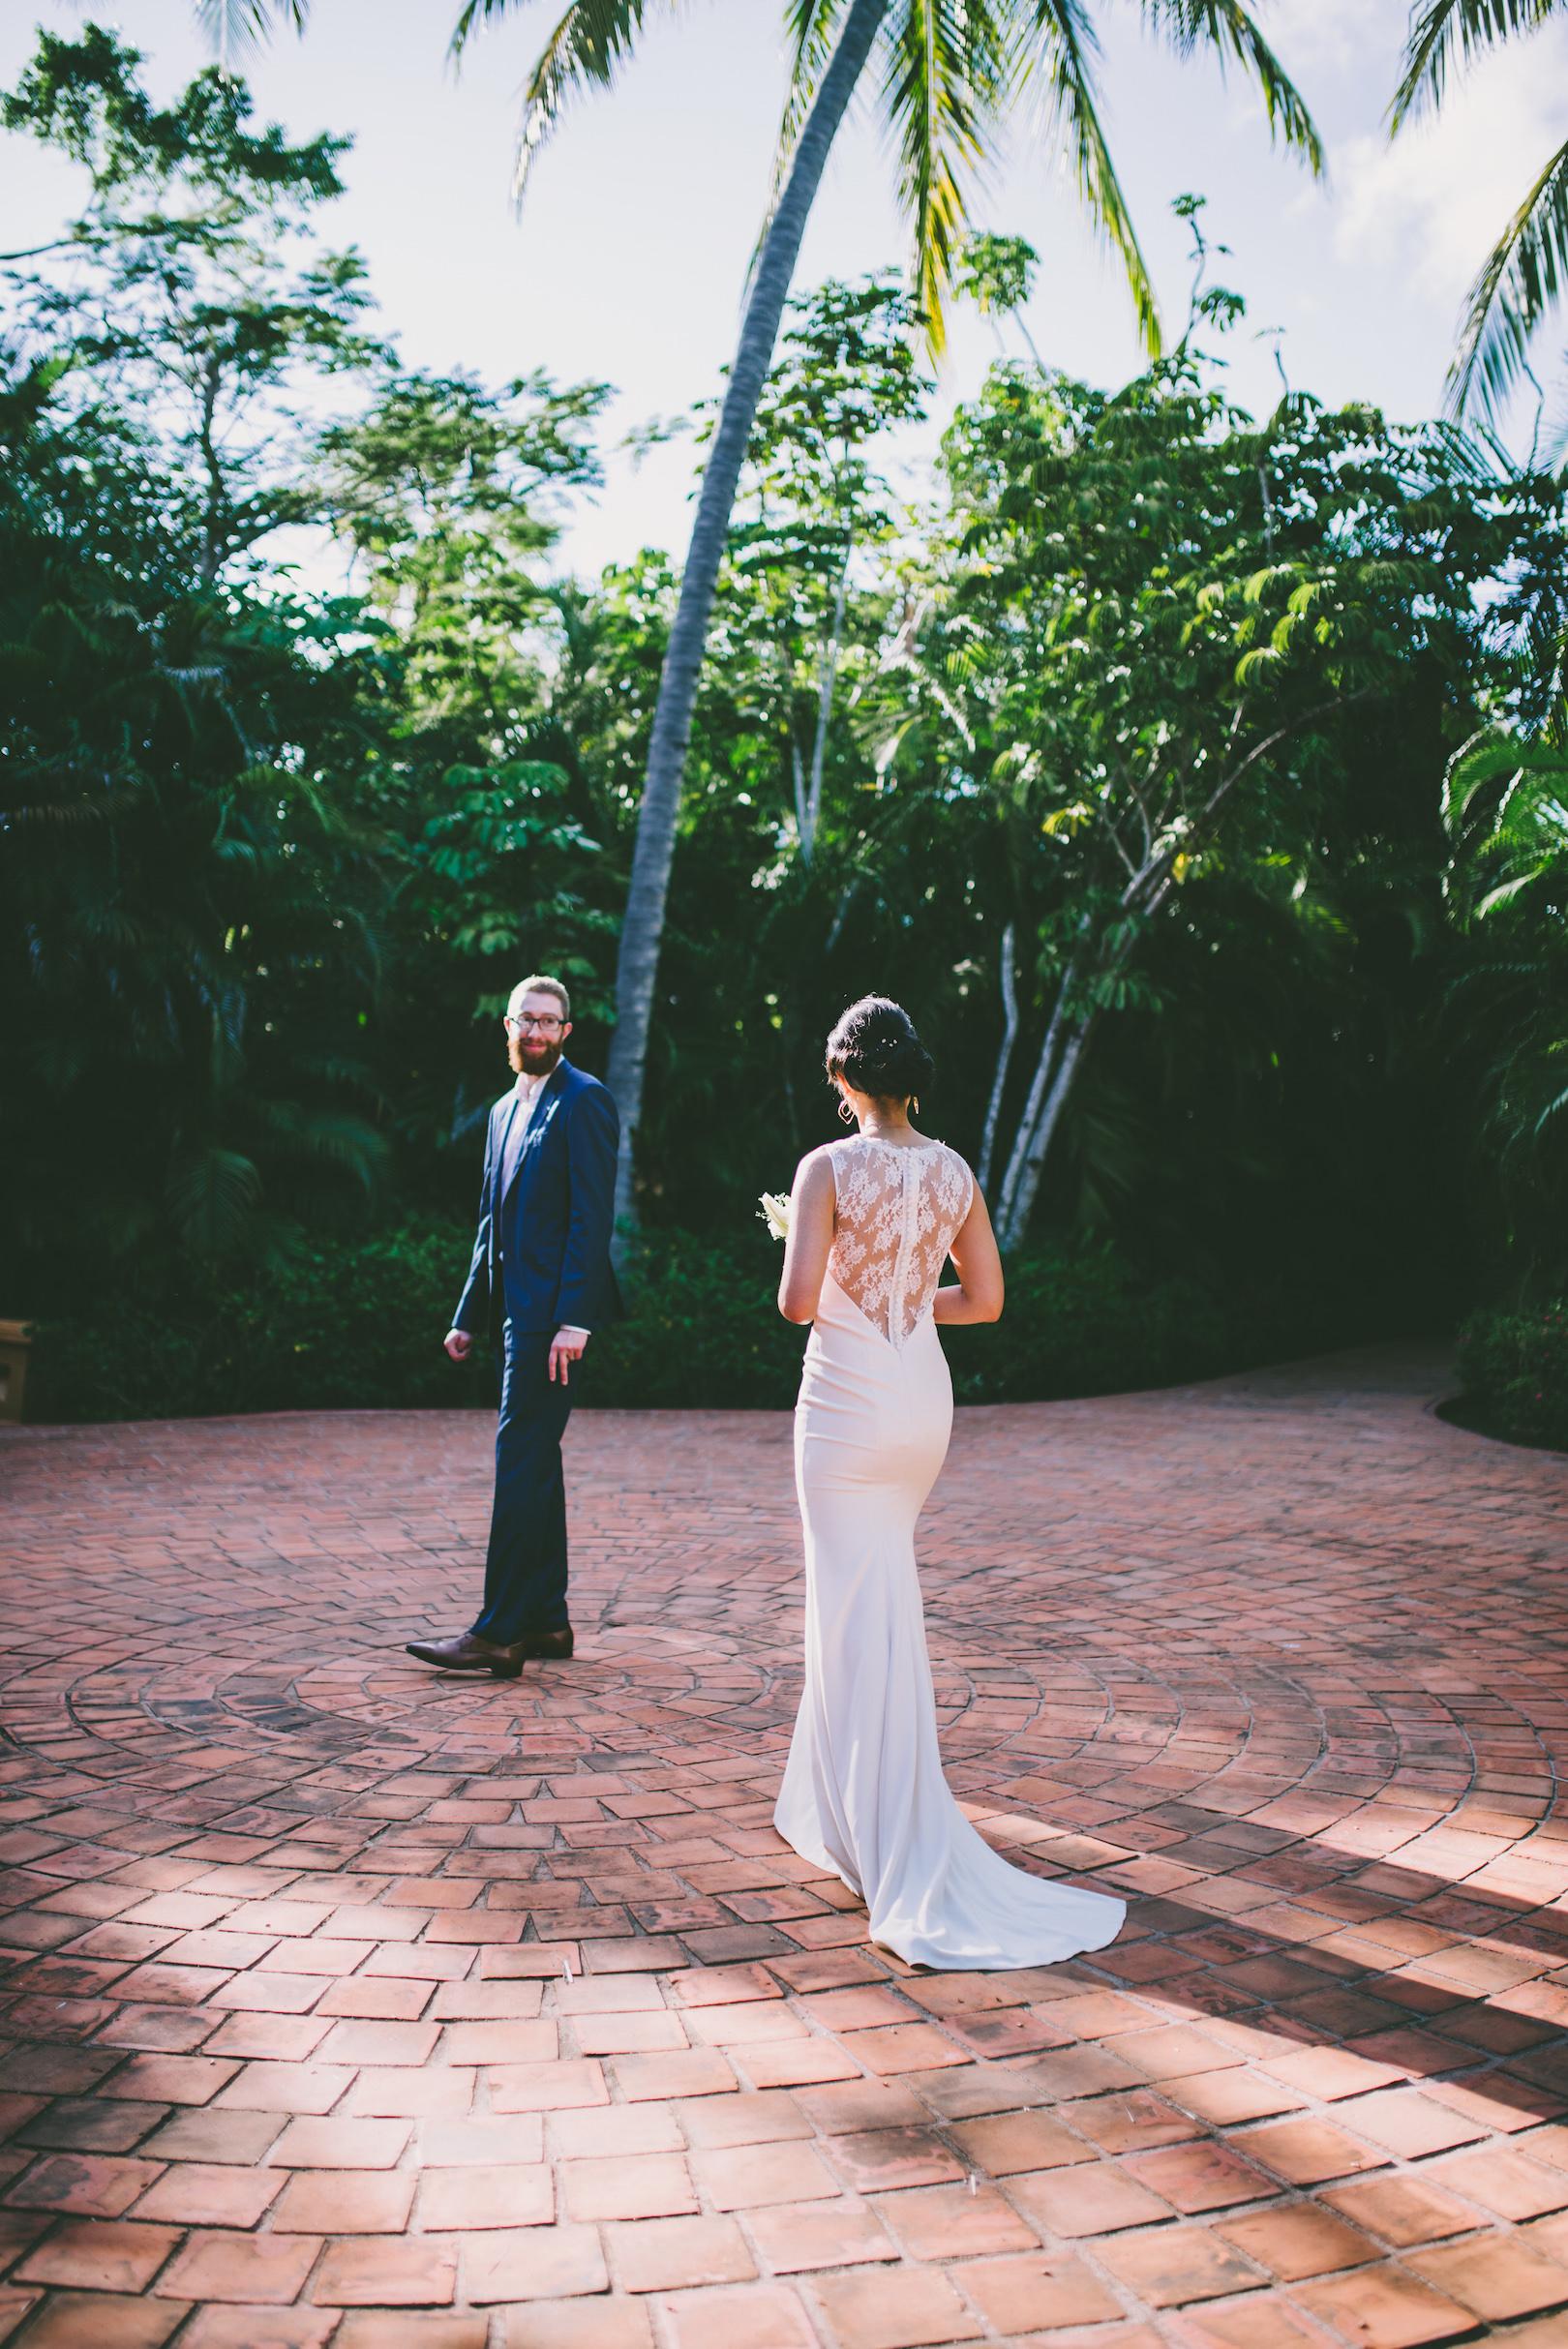 Nathan & Felicia - Wedding Day - © Dallas Kolotylo Photography - 261